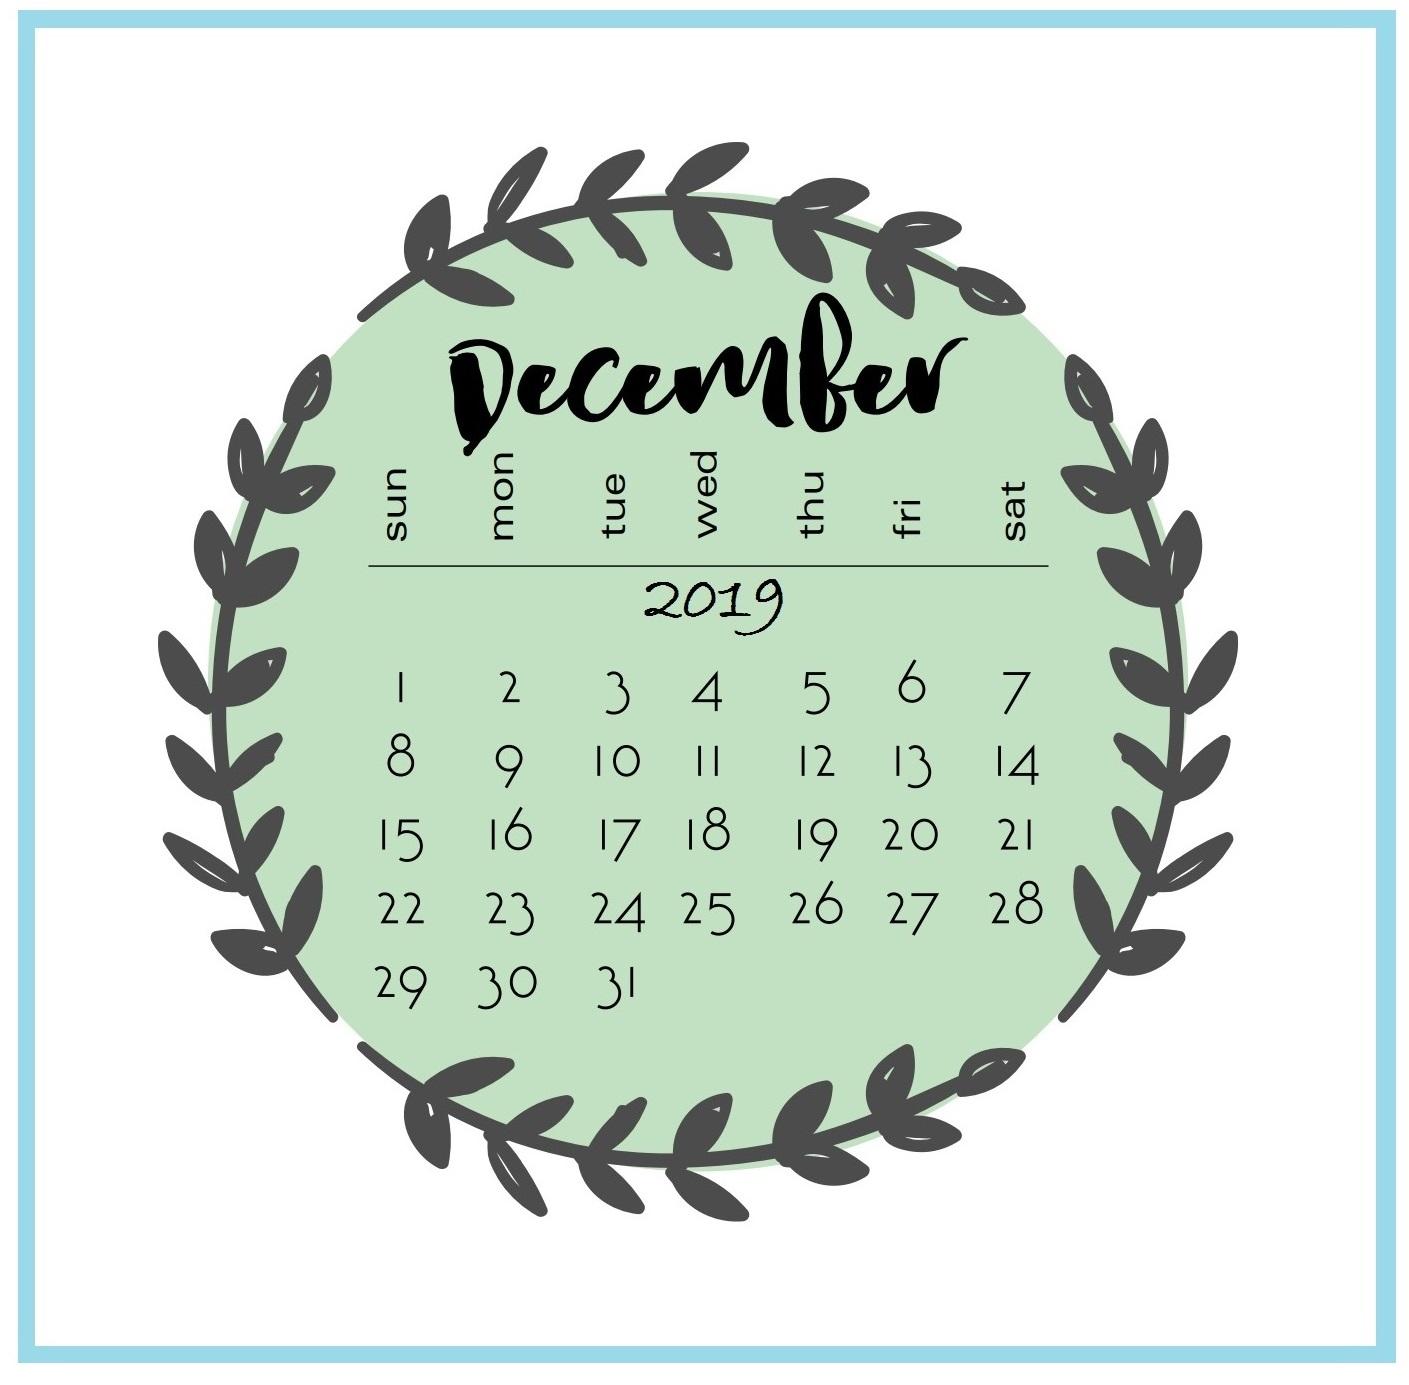 Floral December 2019 Cute Calendar